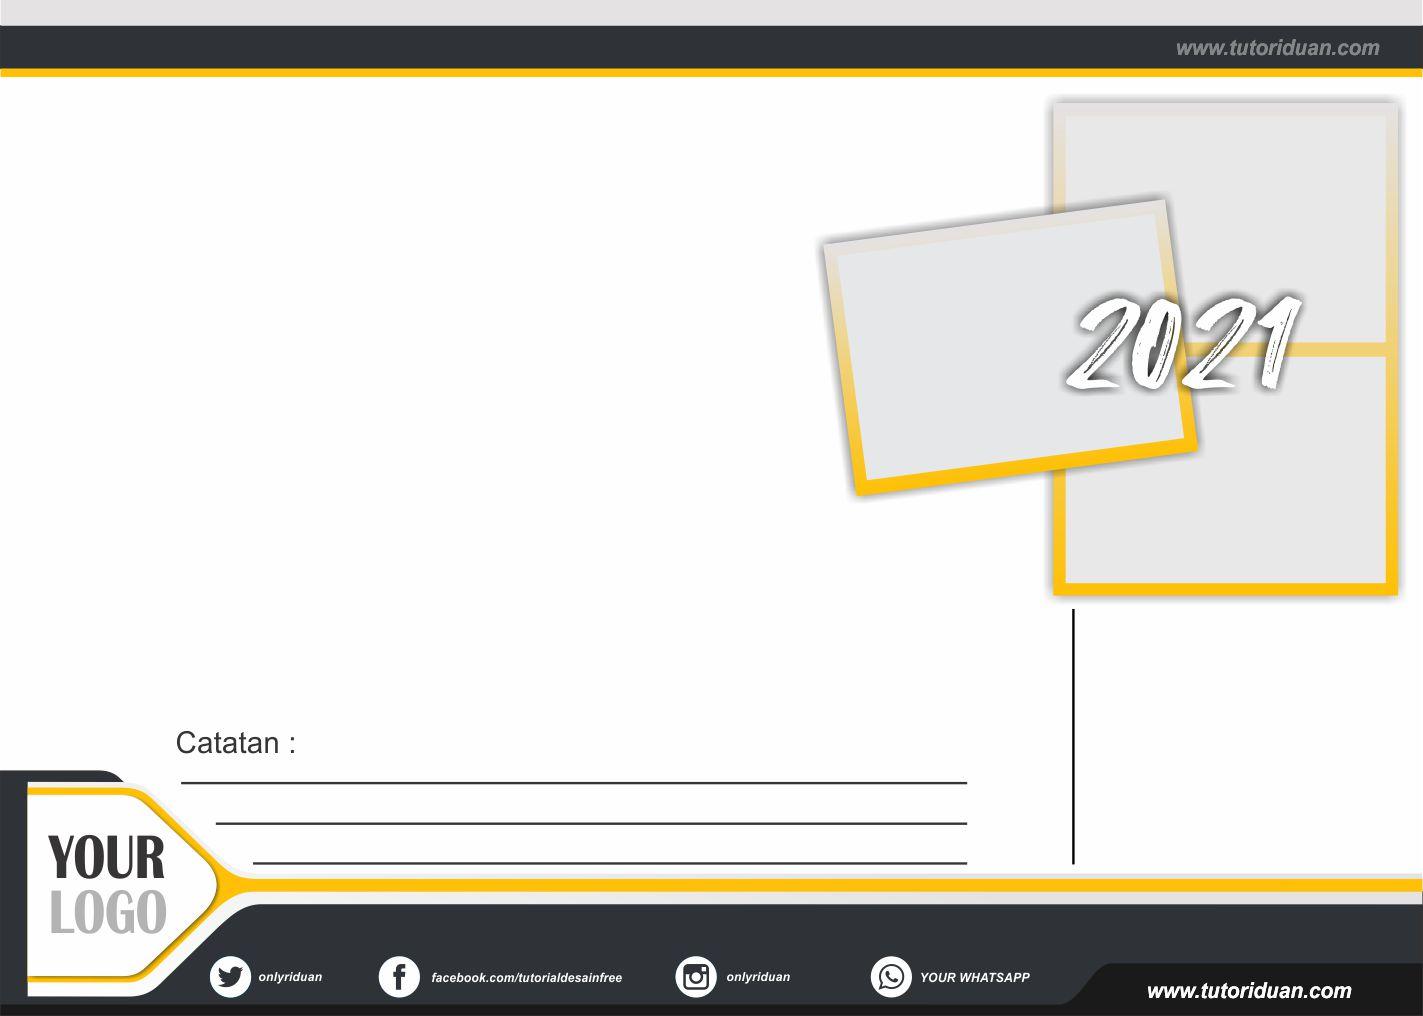 Desain Kalender Duduk 2021 dengan CorelDraw (Free CDR)